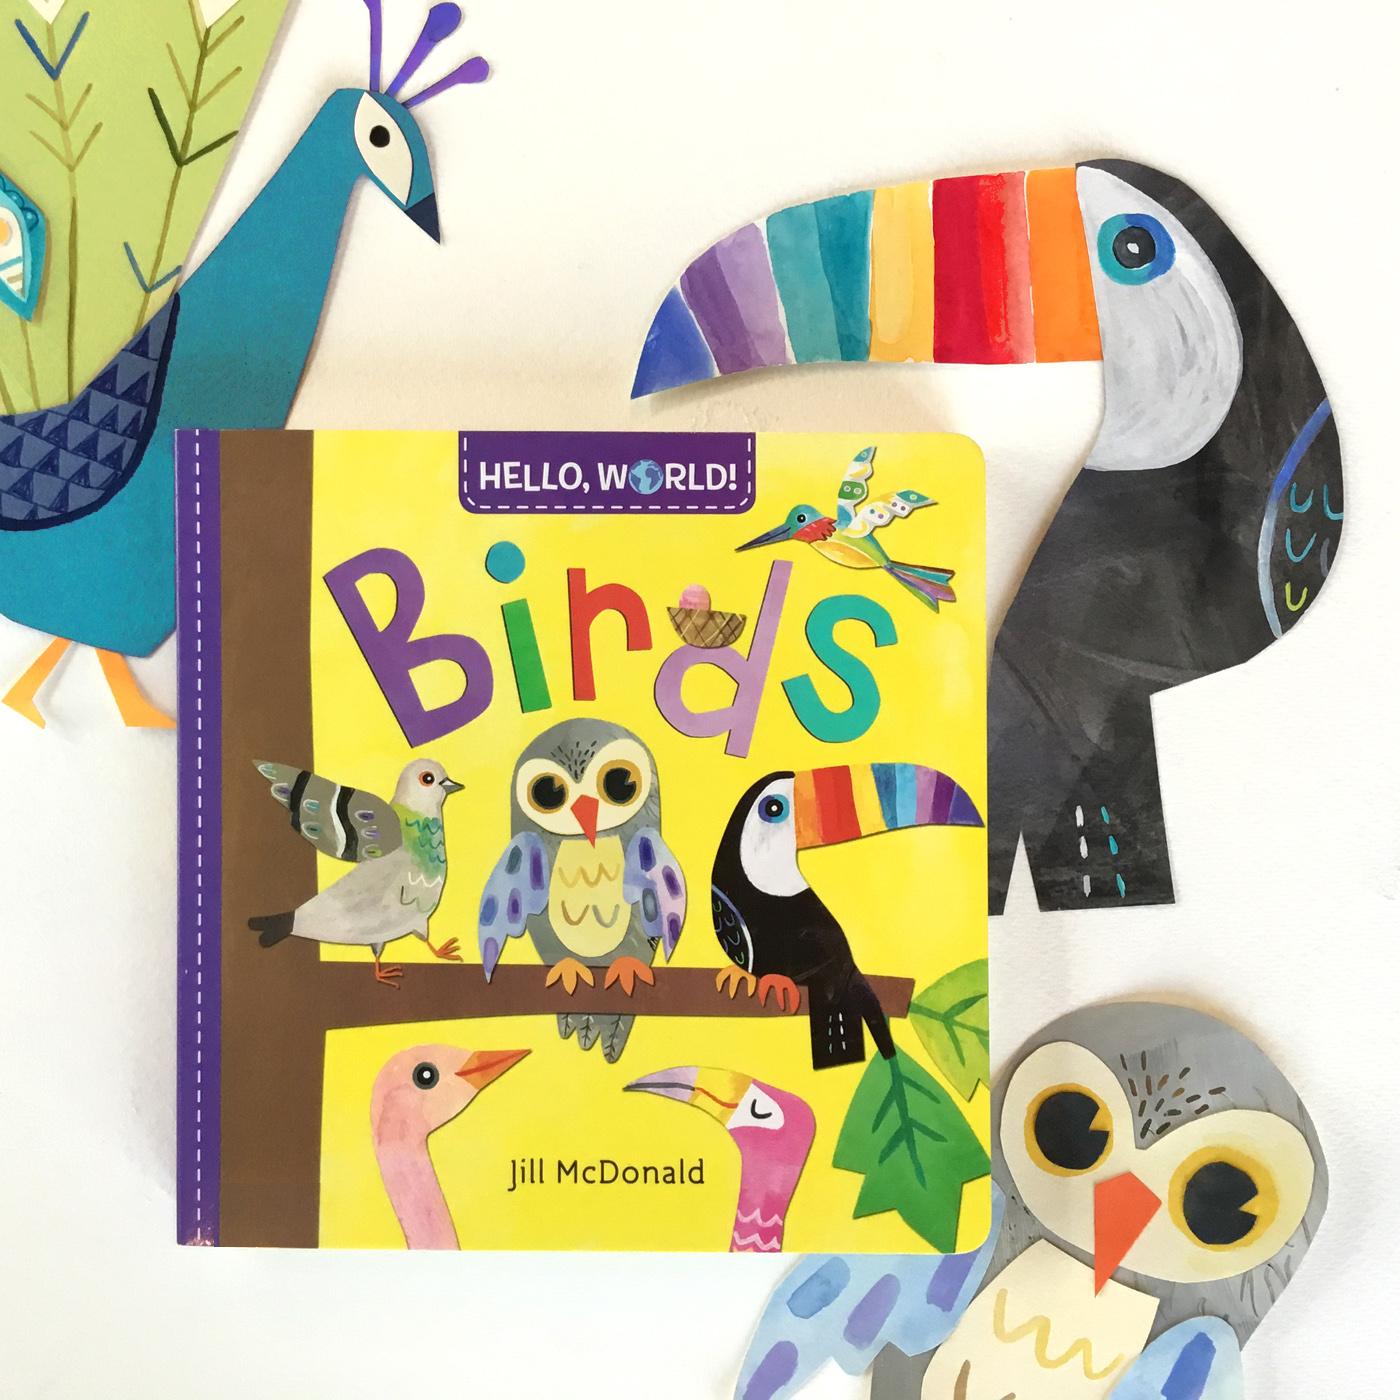 Hello World: Show And Tell: Hello, World! Board Books